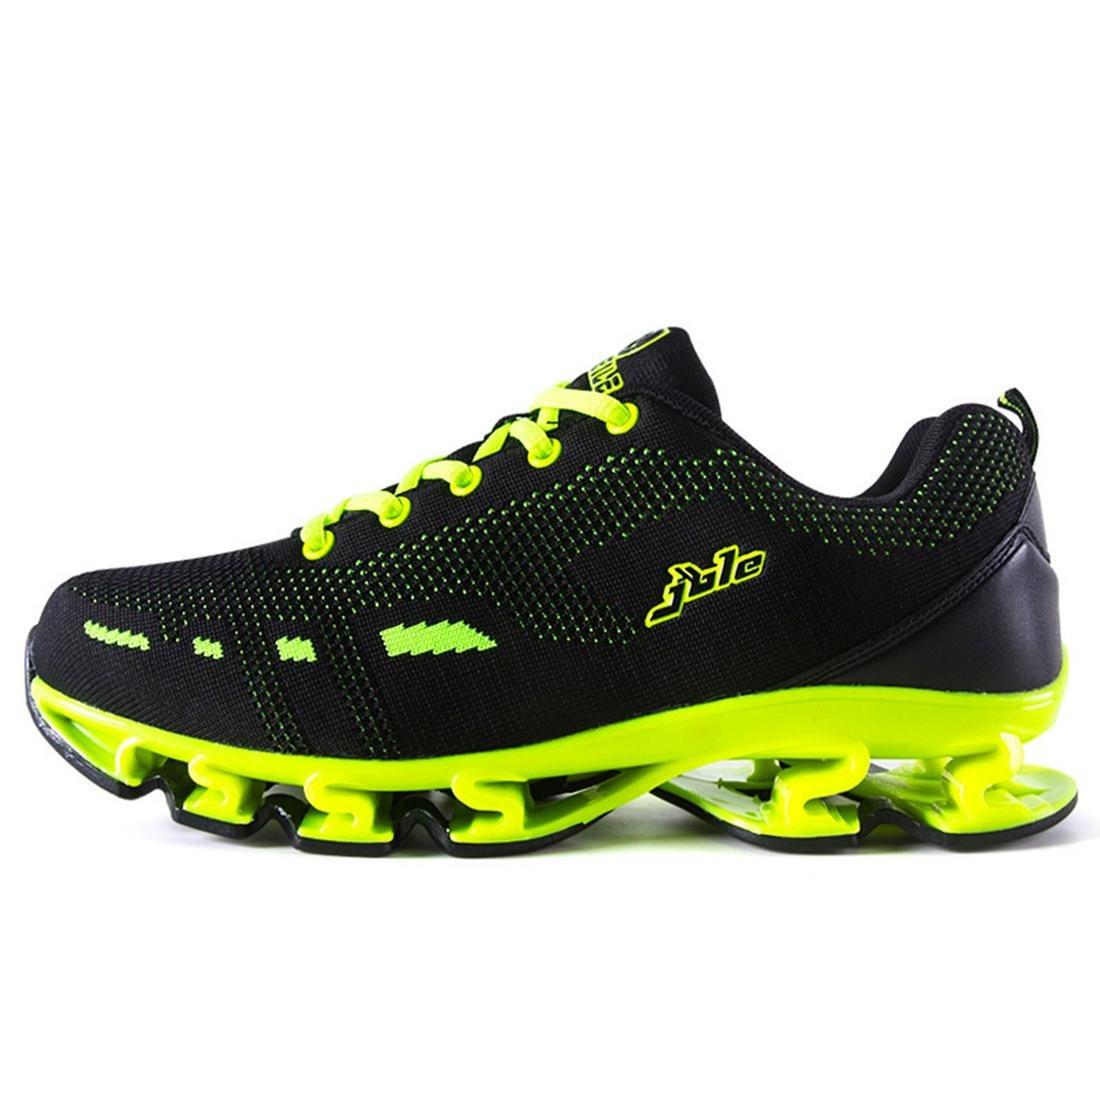 Herren Draussen Sportschuhe Mode Trainer Basketball Schuhe Rutschfest Atmungsaktiv Gemütlich Schuhe erhöhen EUR GRÖSSE 39-44